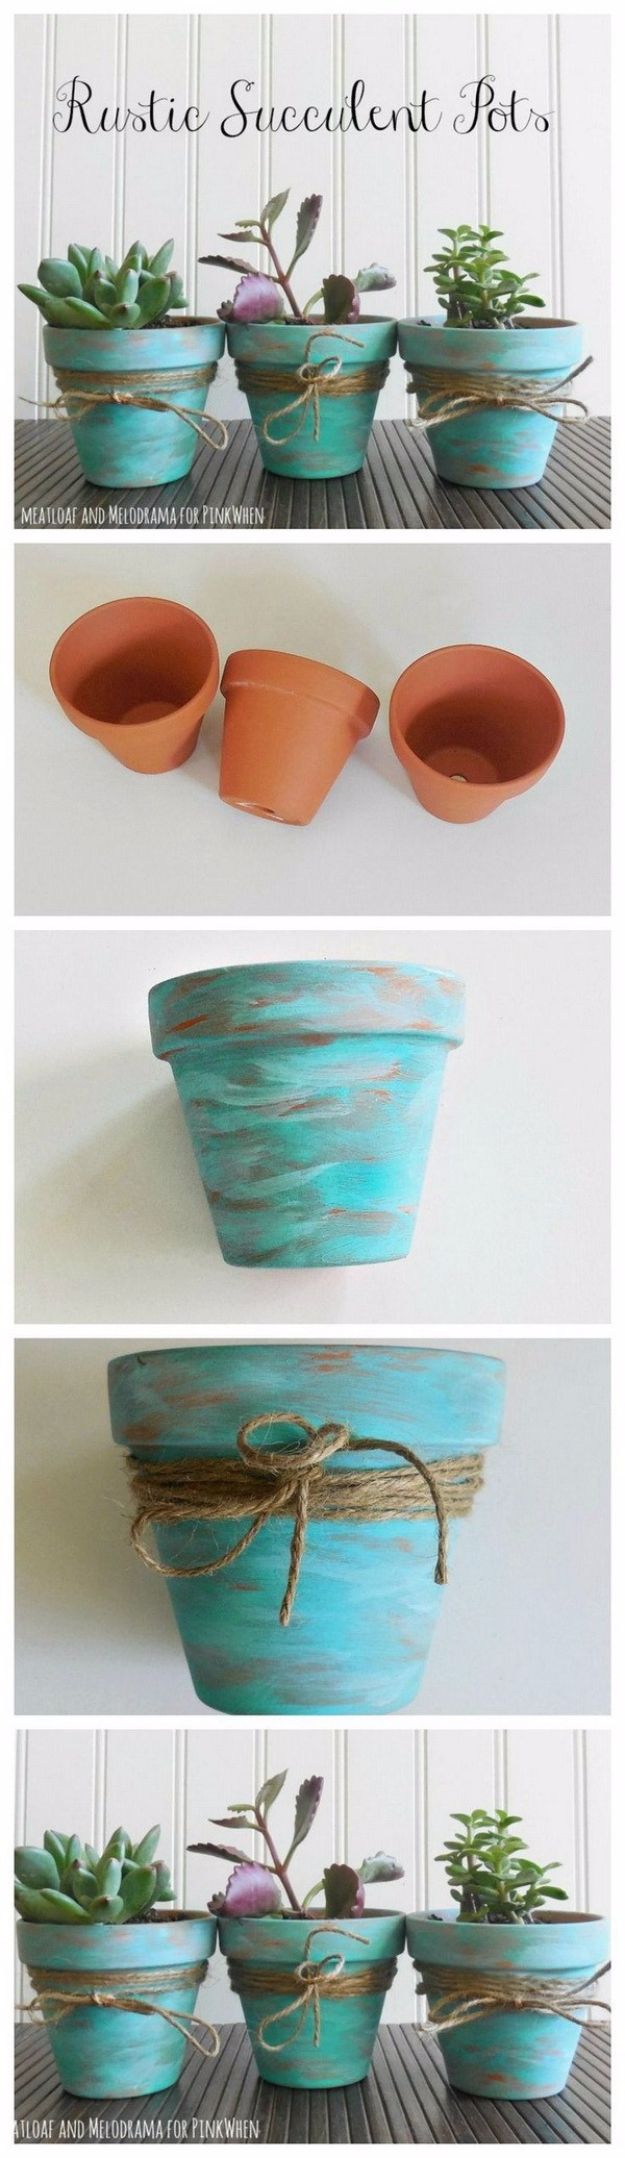 DIY Farmhouse Style Decor Ideas - Rustic Succulent Pots - Rustic Ideas for Furniture, Paint Colors, Farm House Decoration for Living Room, Kitchen and Bedroom #diy